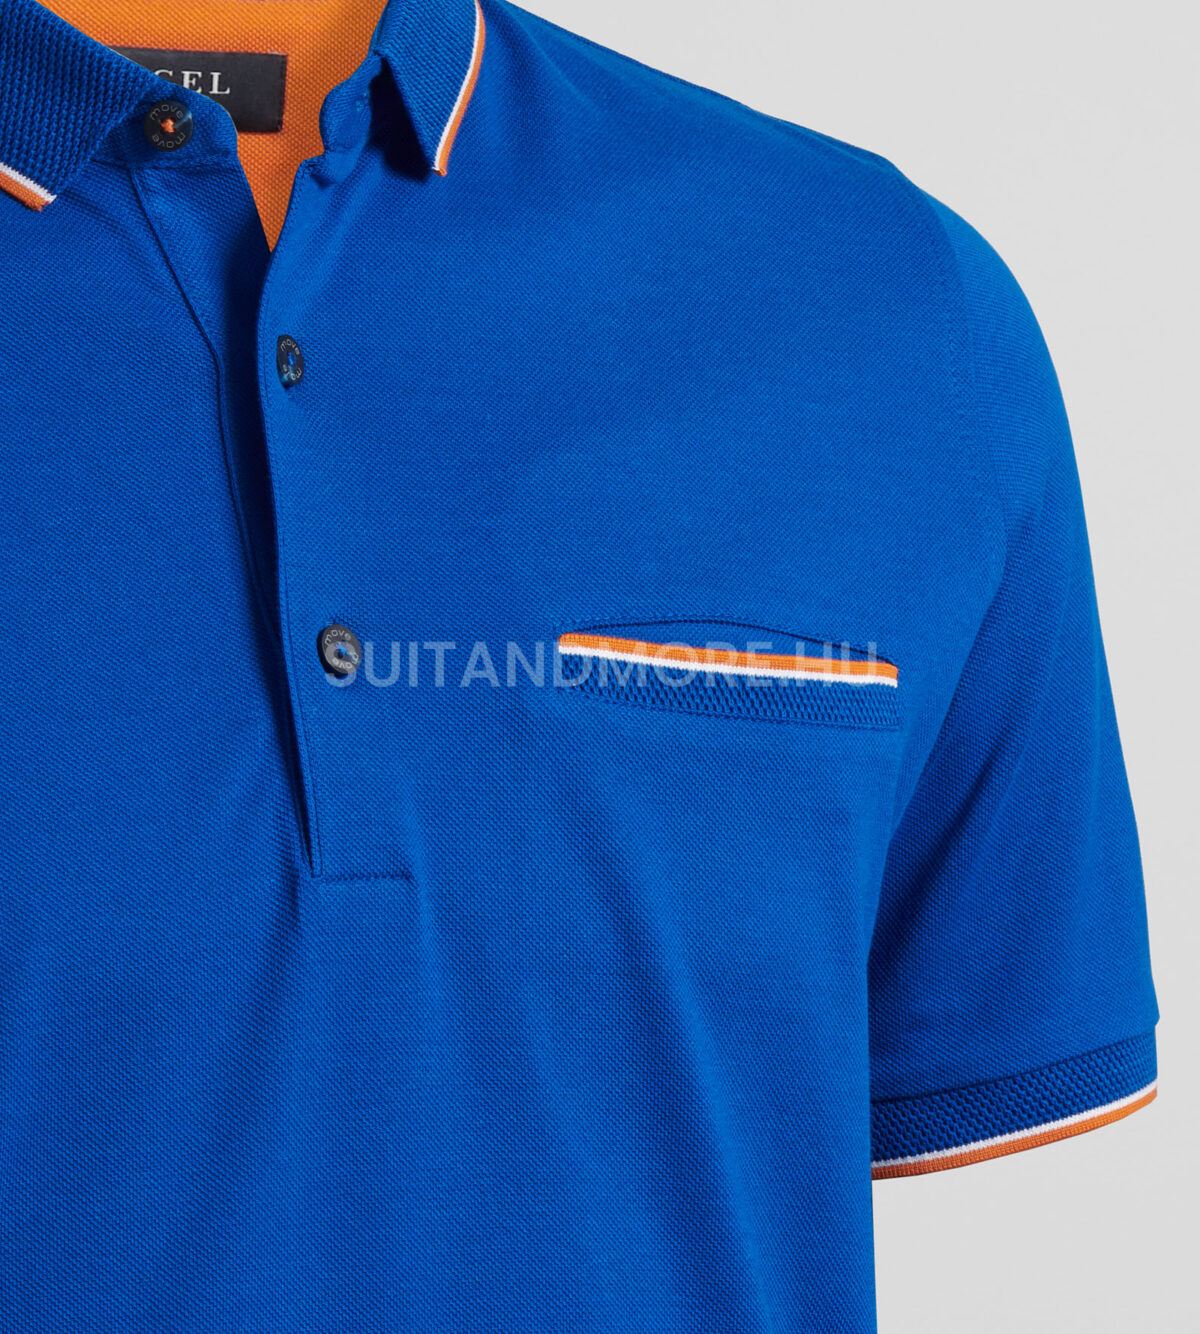 DIGEL-kék-slim-fit-ingpóló-ANDREA-1-2-1188111-24-02